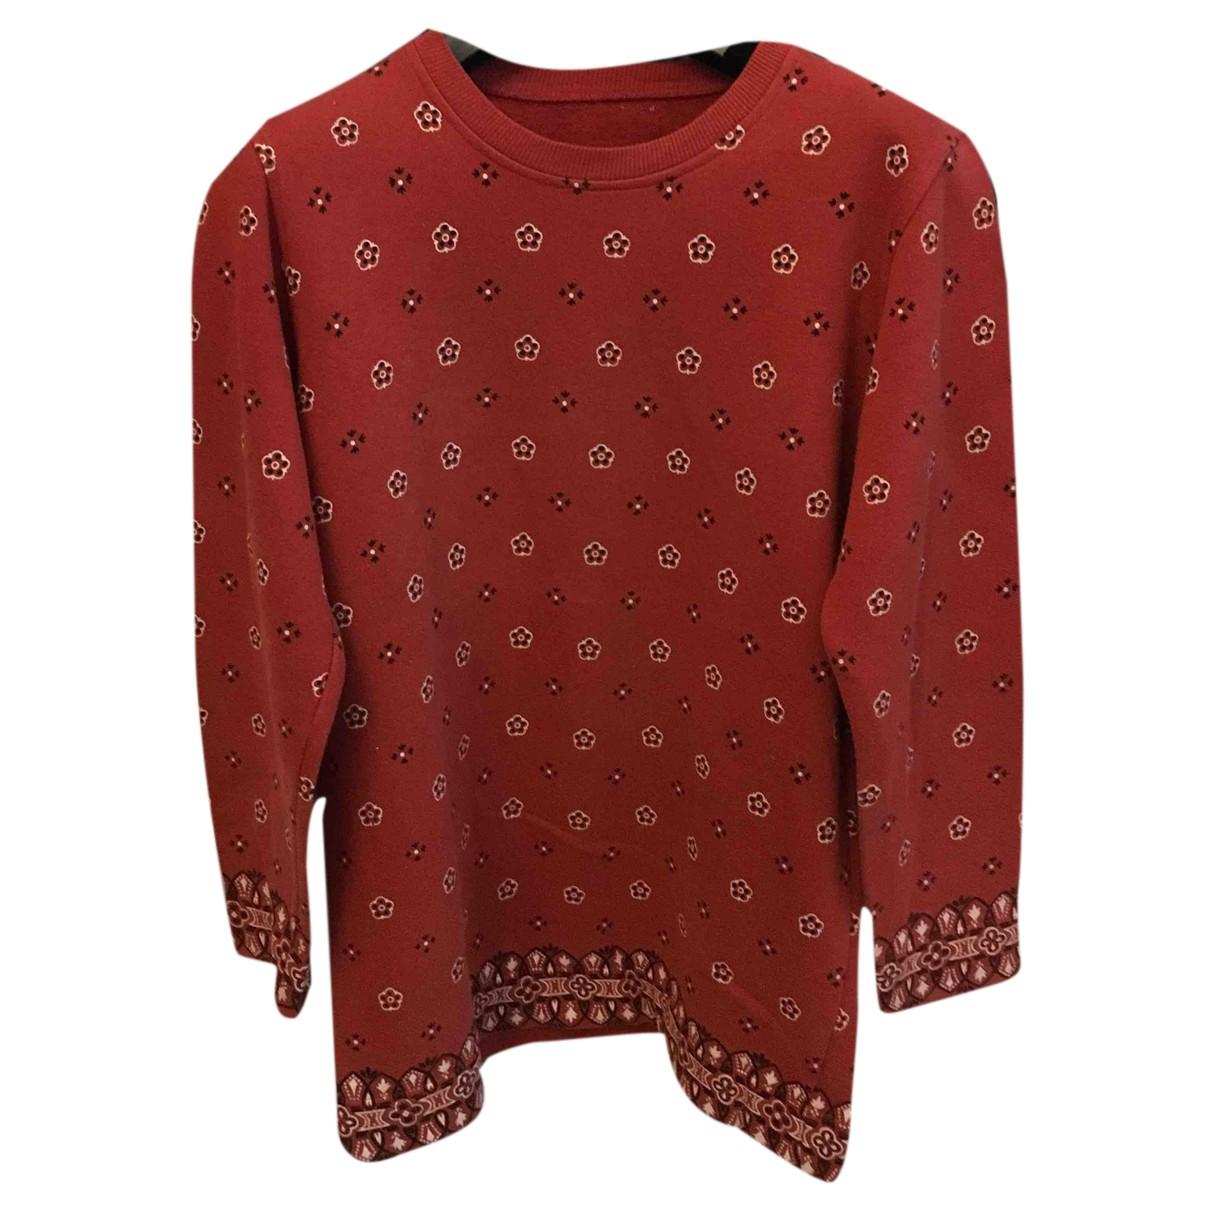 Moschino Cheap And Chic - Pull   pour femme en coton - bordeaux